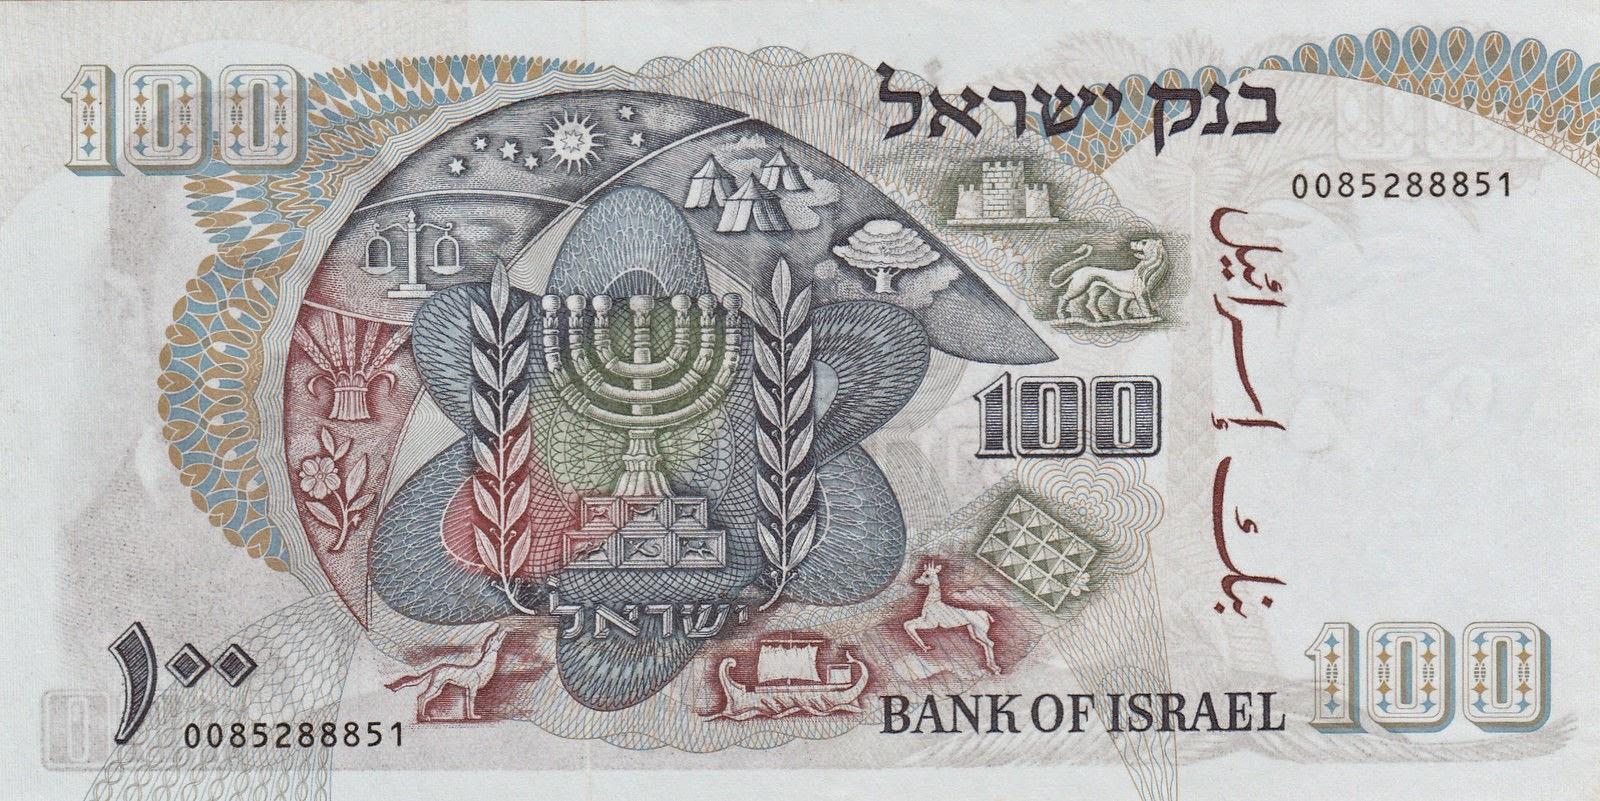 Israel Banknotes 100 Israeli Pounds 1968